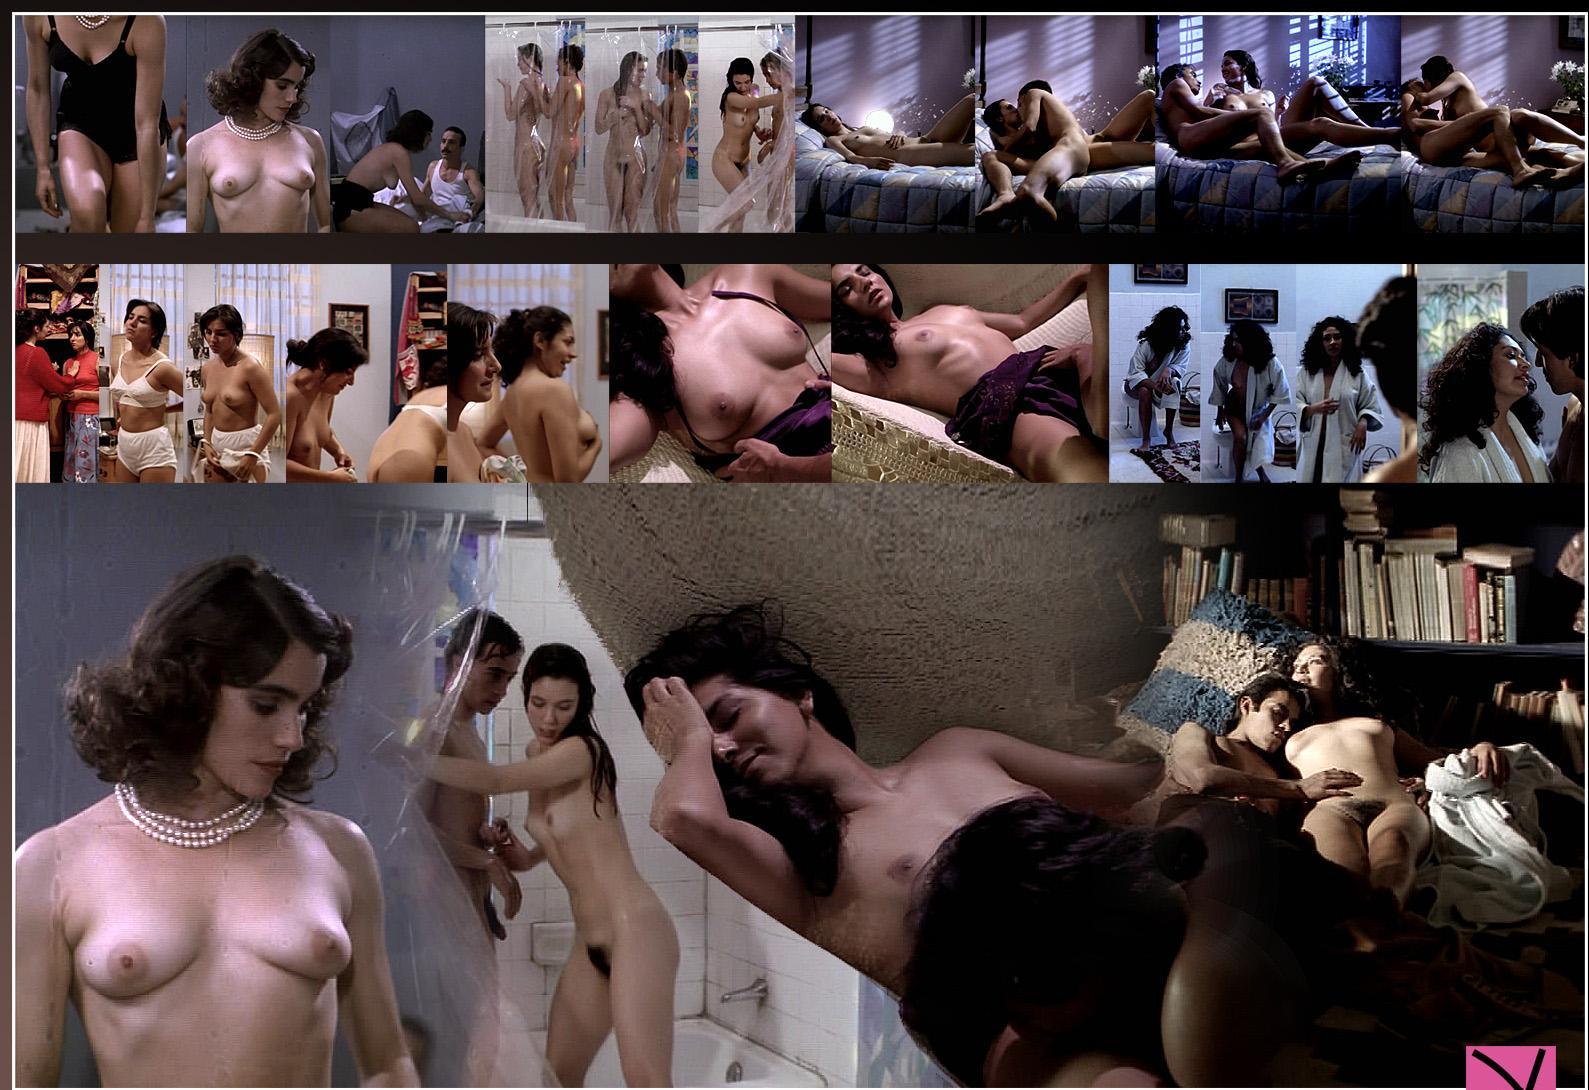 эротика мексика фильм